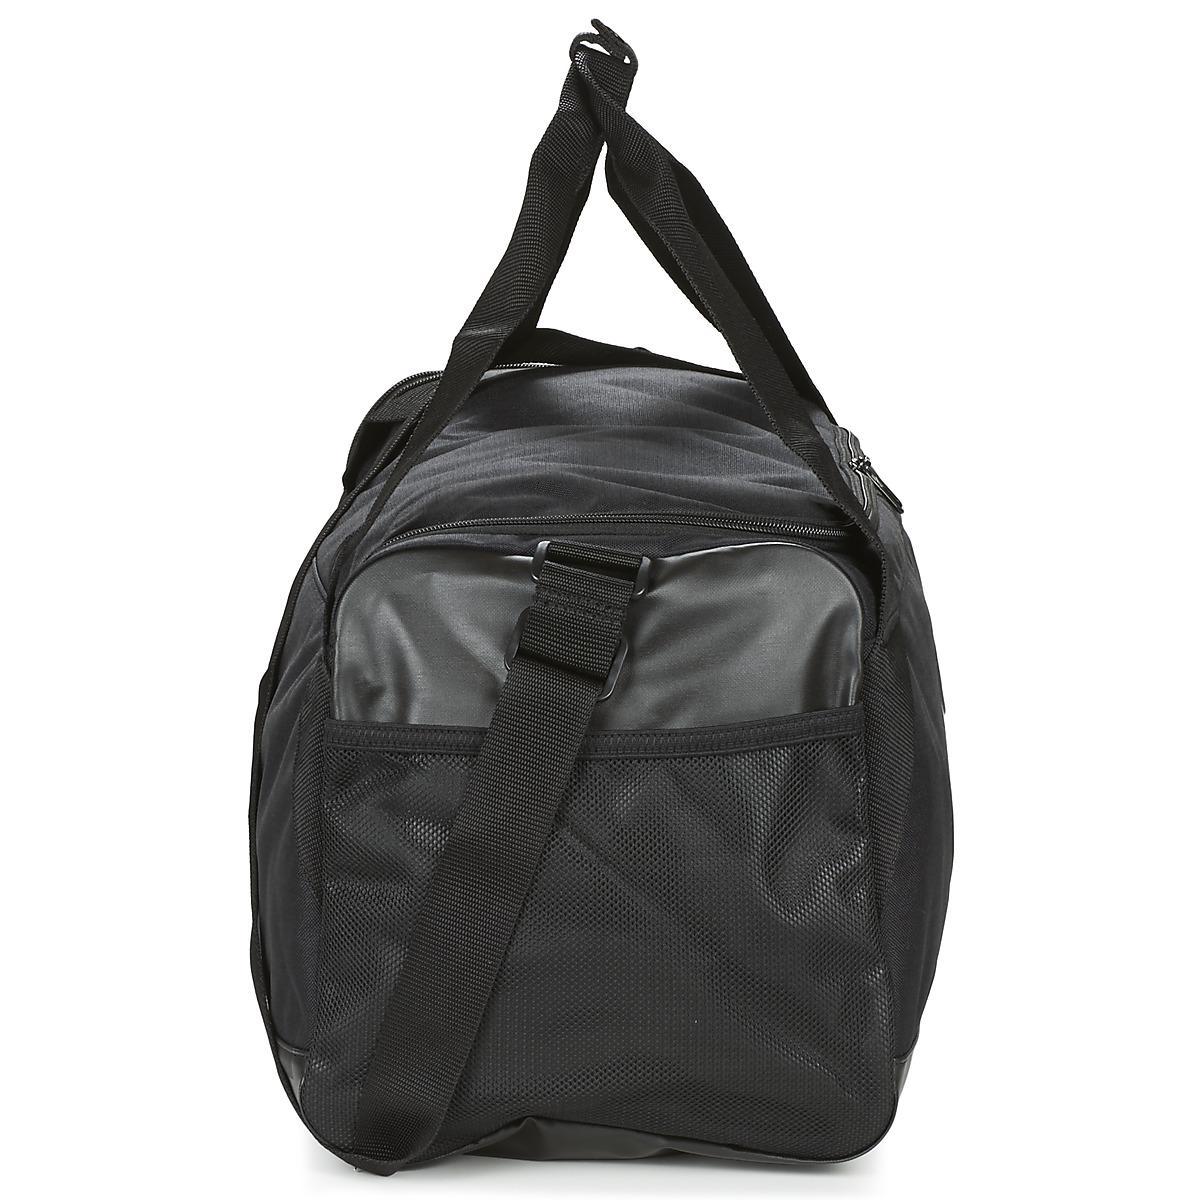 a8b032df04 ... online retailer 86b5f e4872 Nike - Brasilia (small) Duffel Bag Mens  Sports Bag In ...